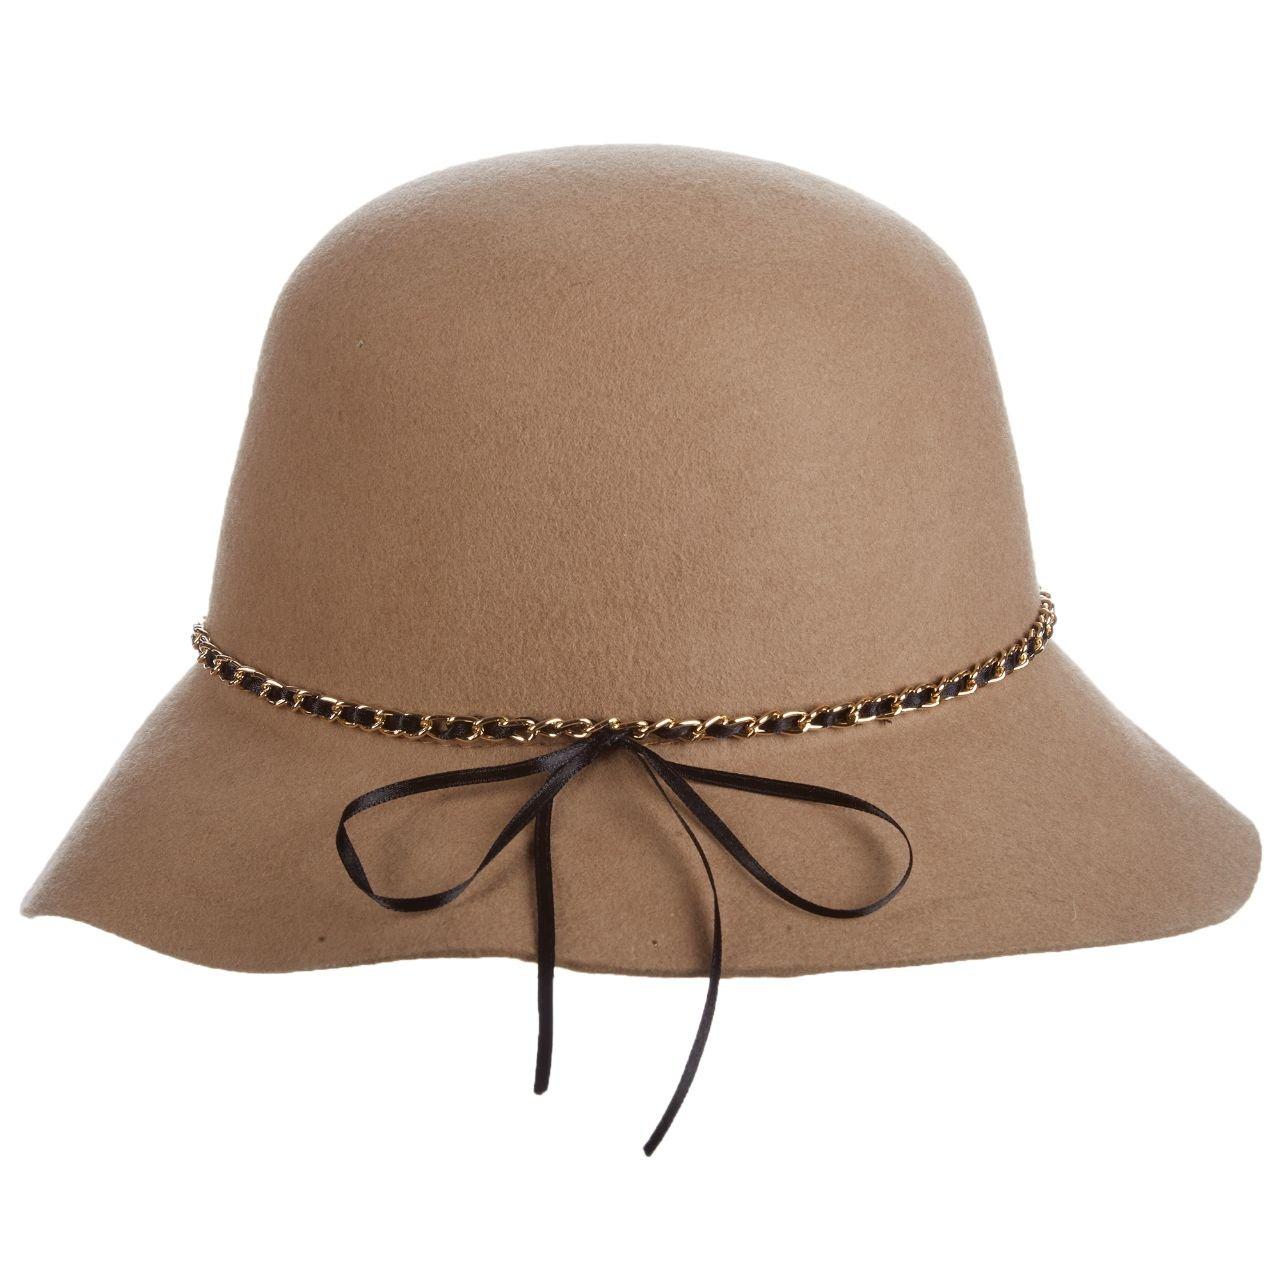 SCALA Wool Felt Cloche with Chain HAT (Camel)